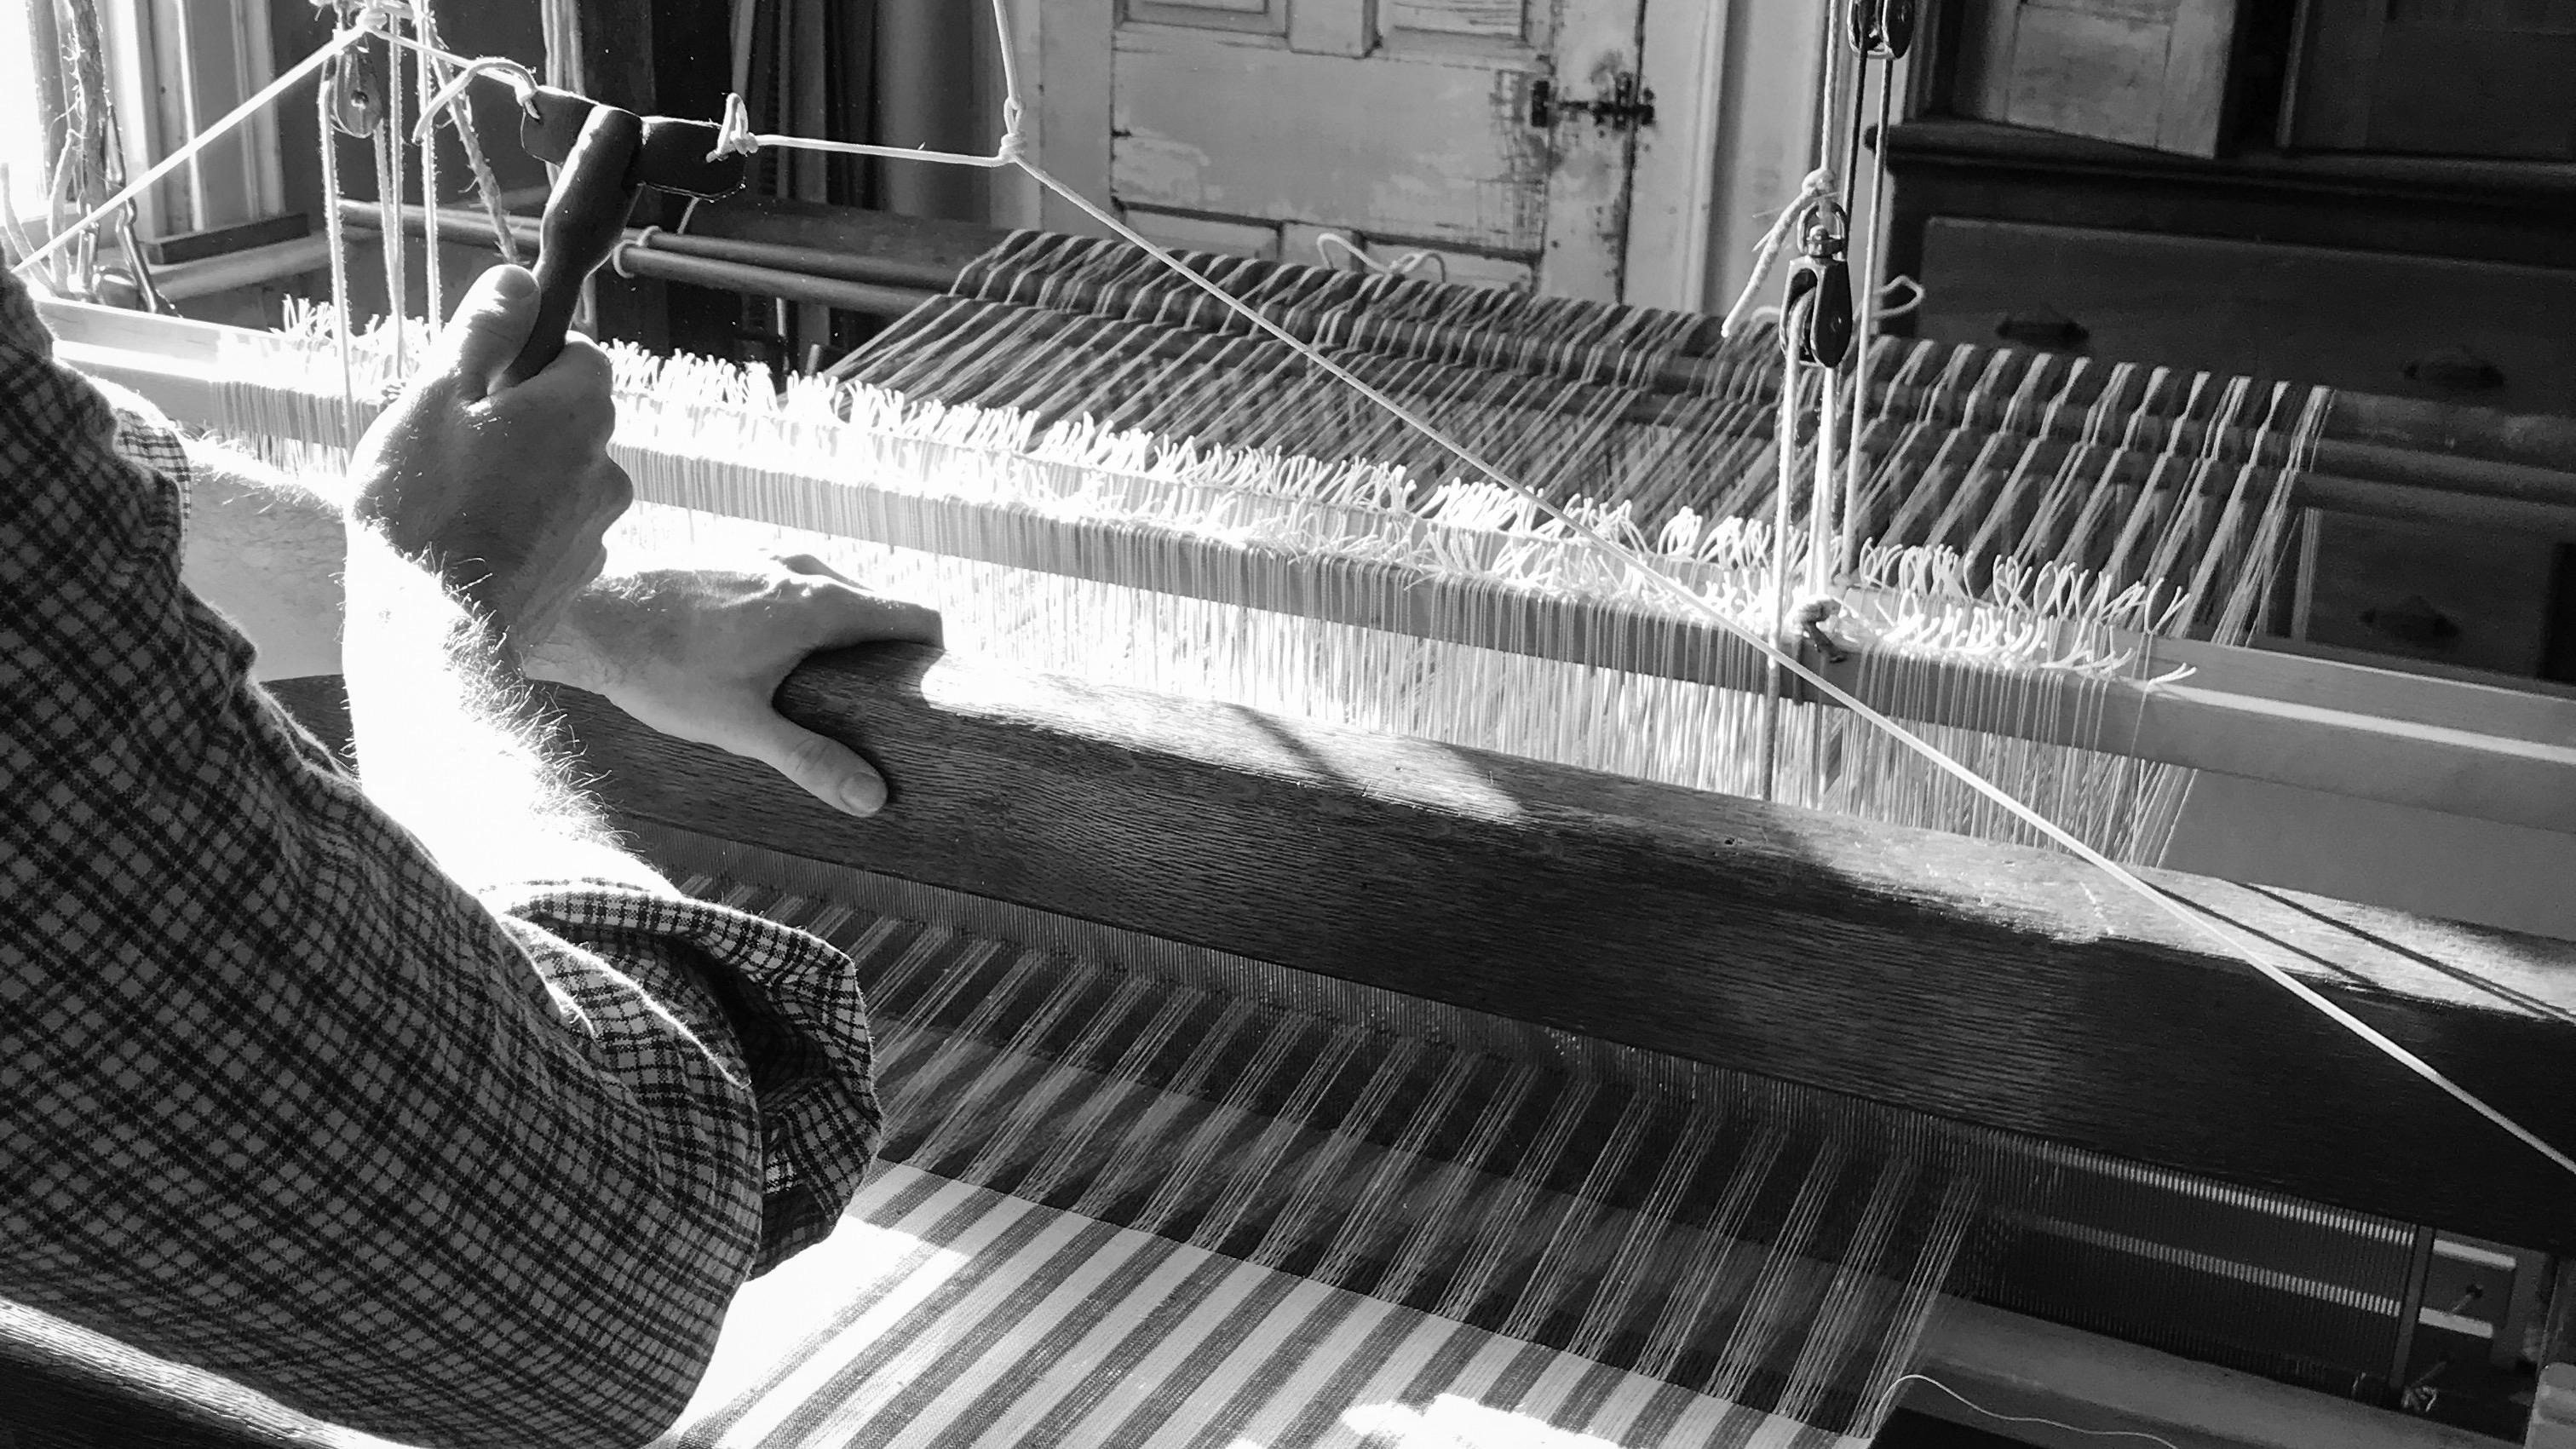 Justin Squizzero weaving linen barn loom